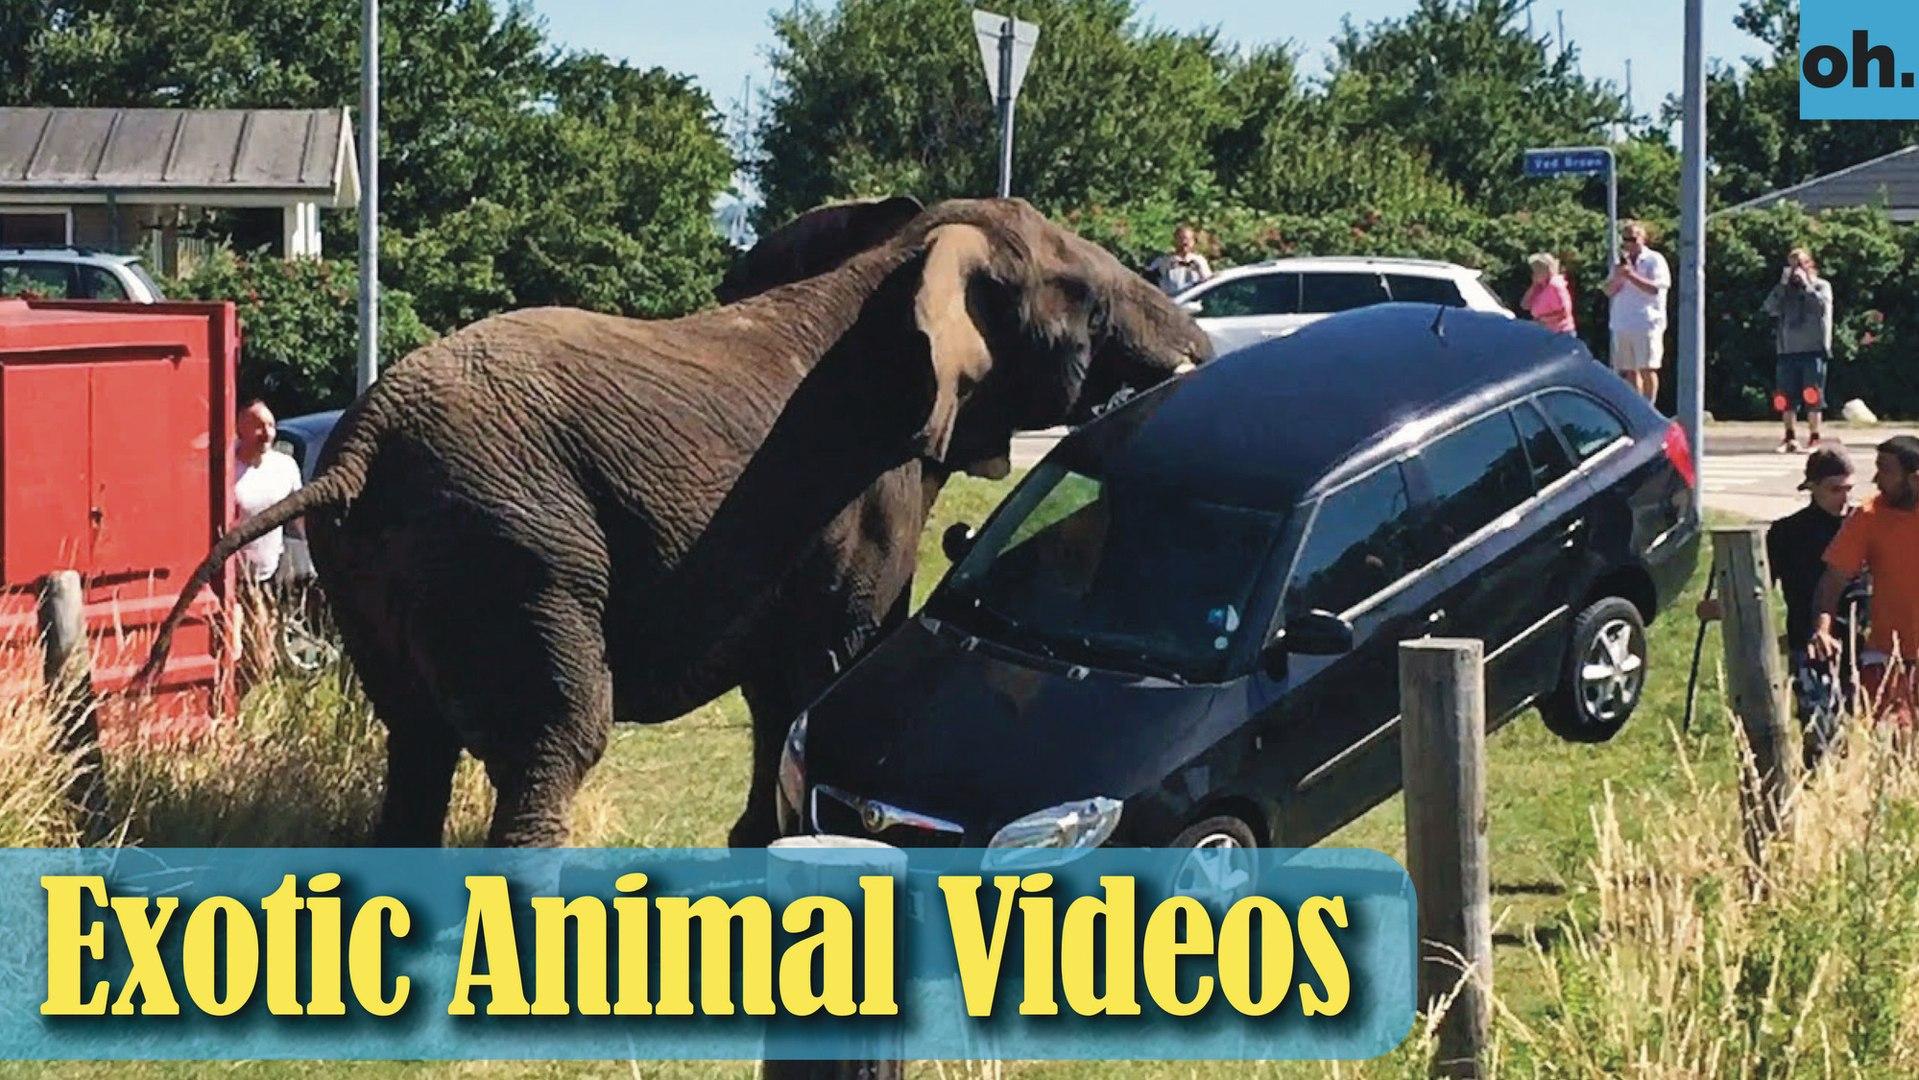 Animal Video - Wild Animals - Rainforest  Animals - Rare Animals Zoo - Exotic Animals For Sale P3